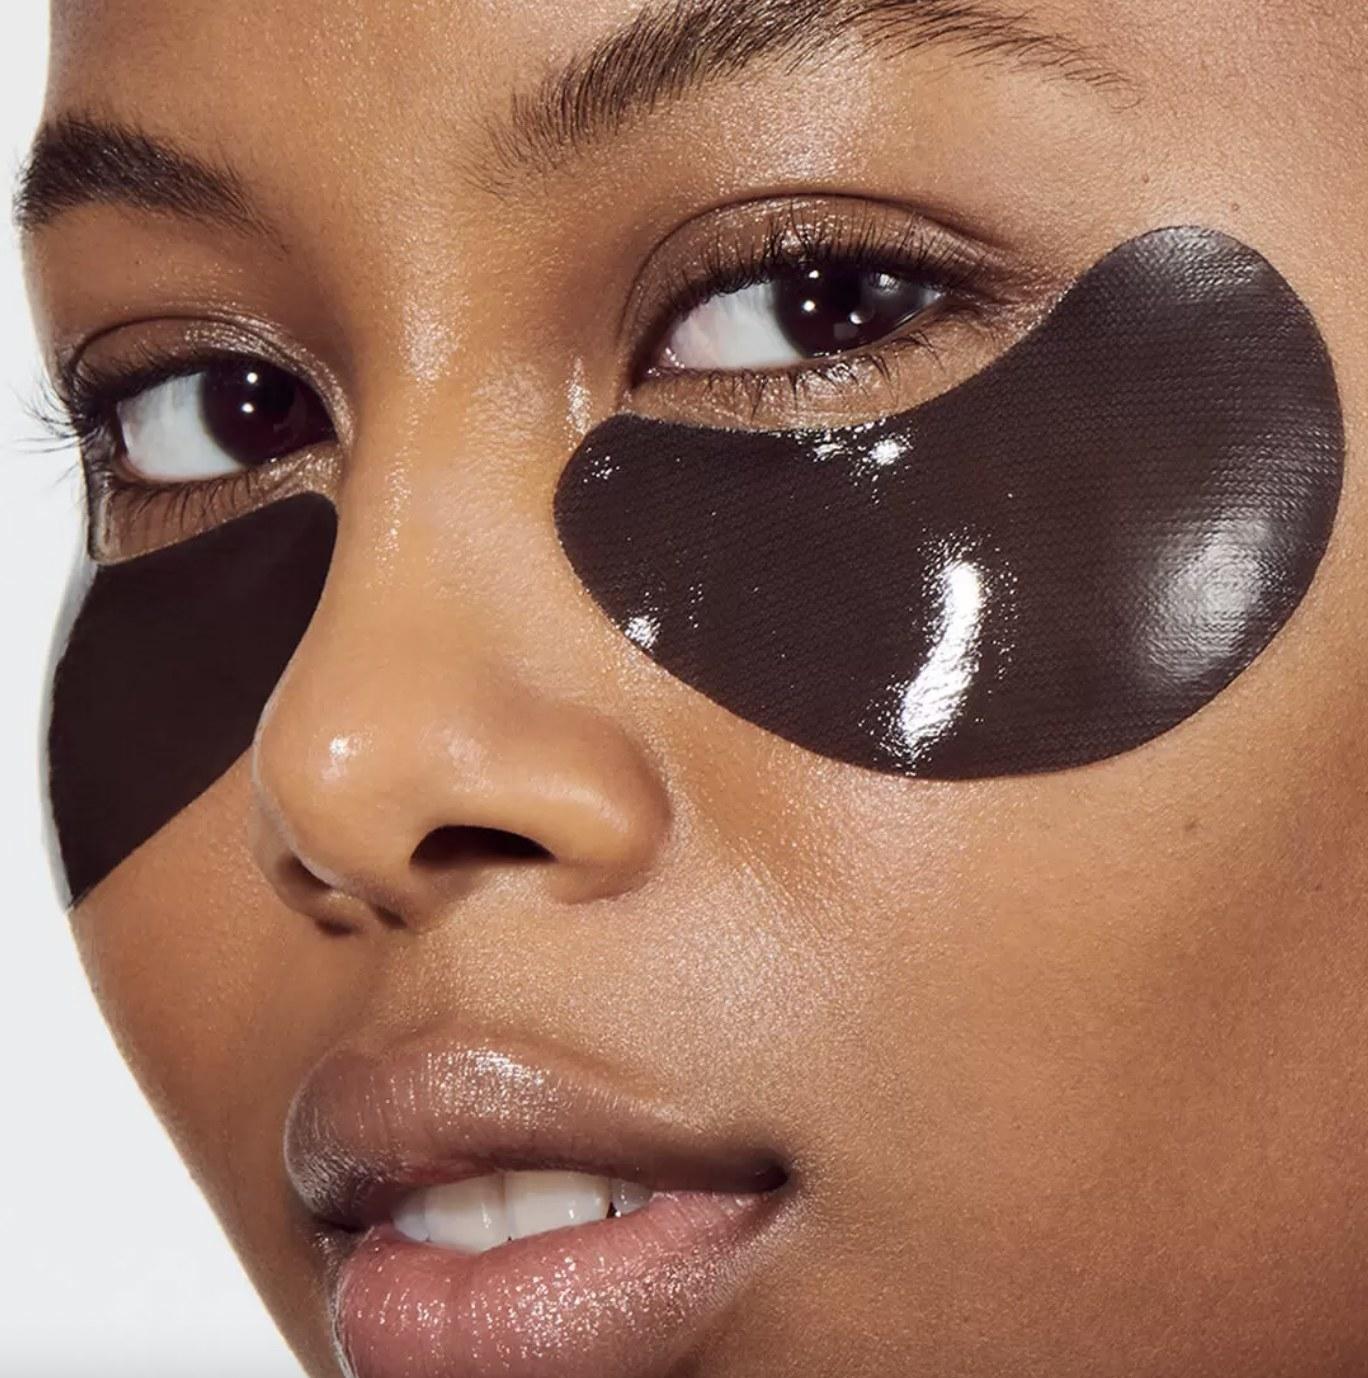 A woman wearing black under eye masks